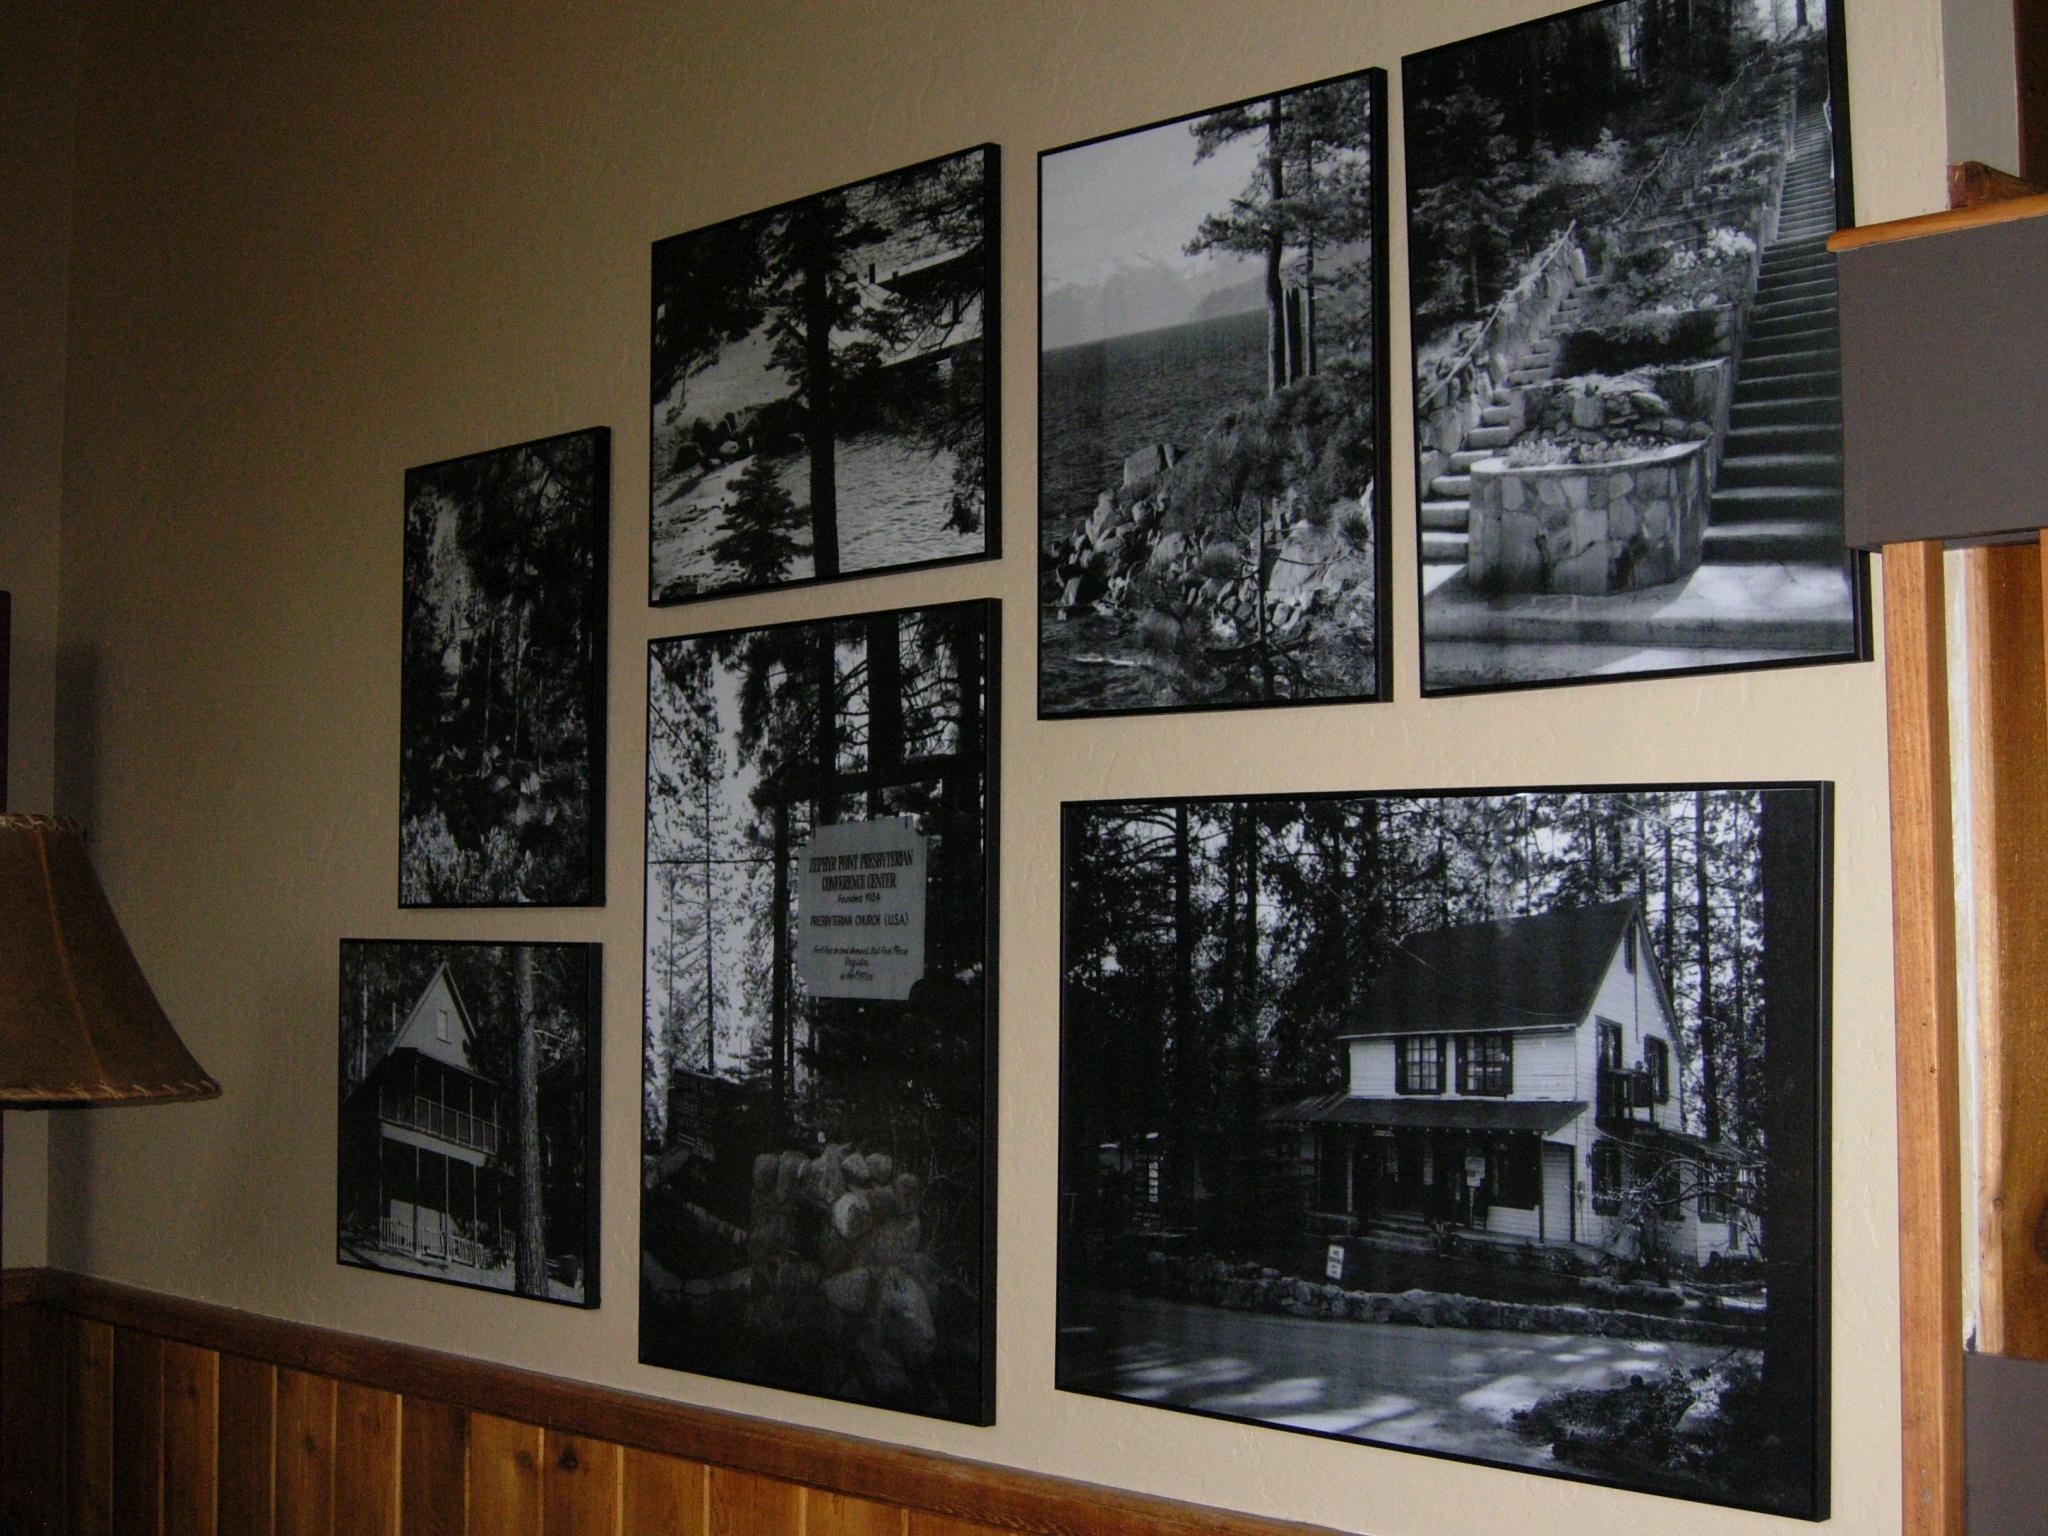 Old Tahoe Photo Gallery